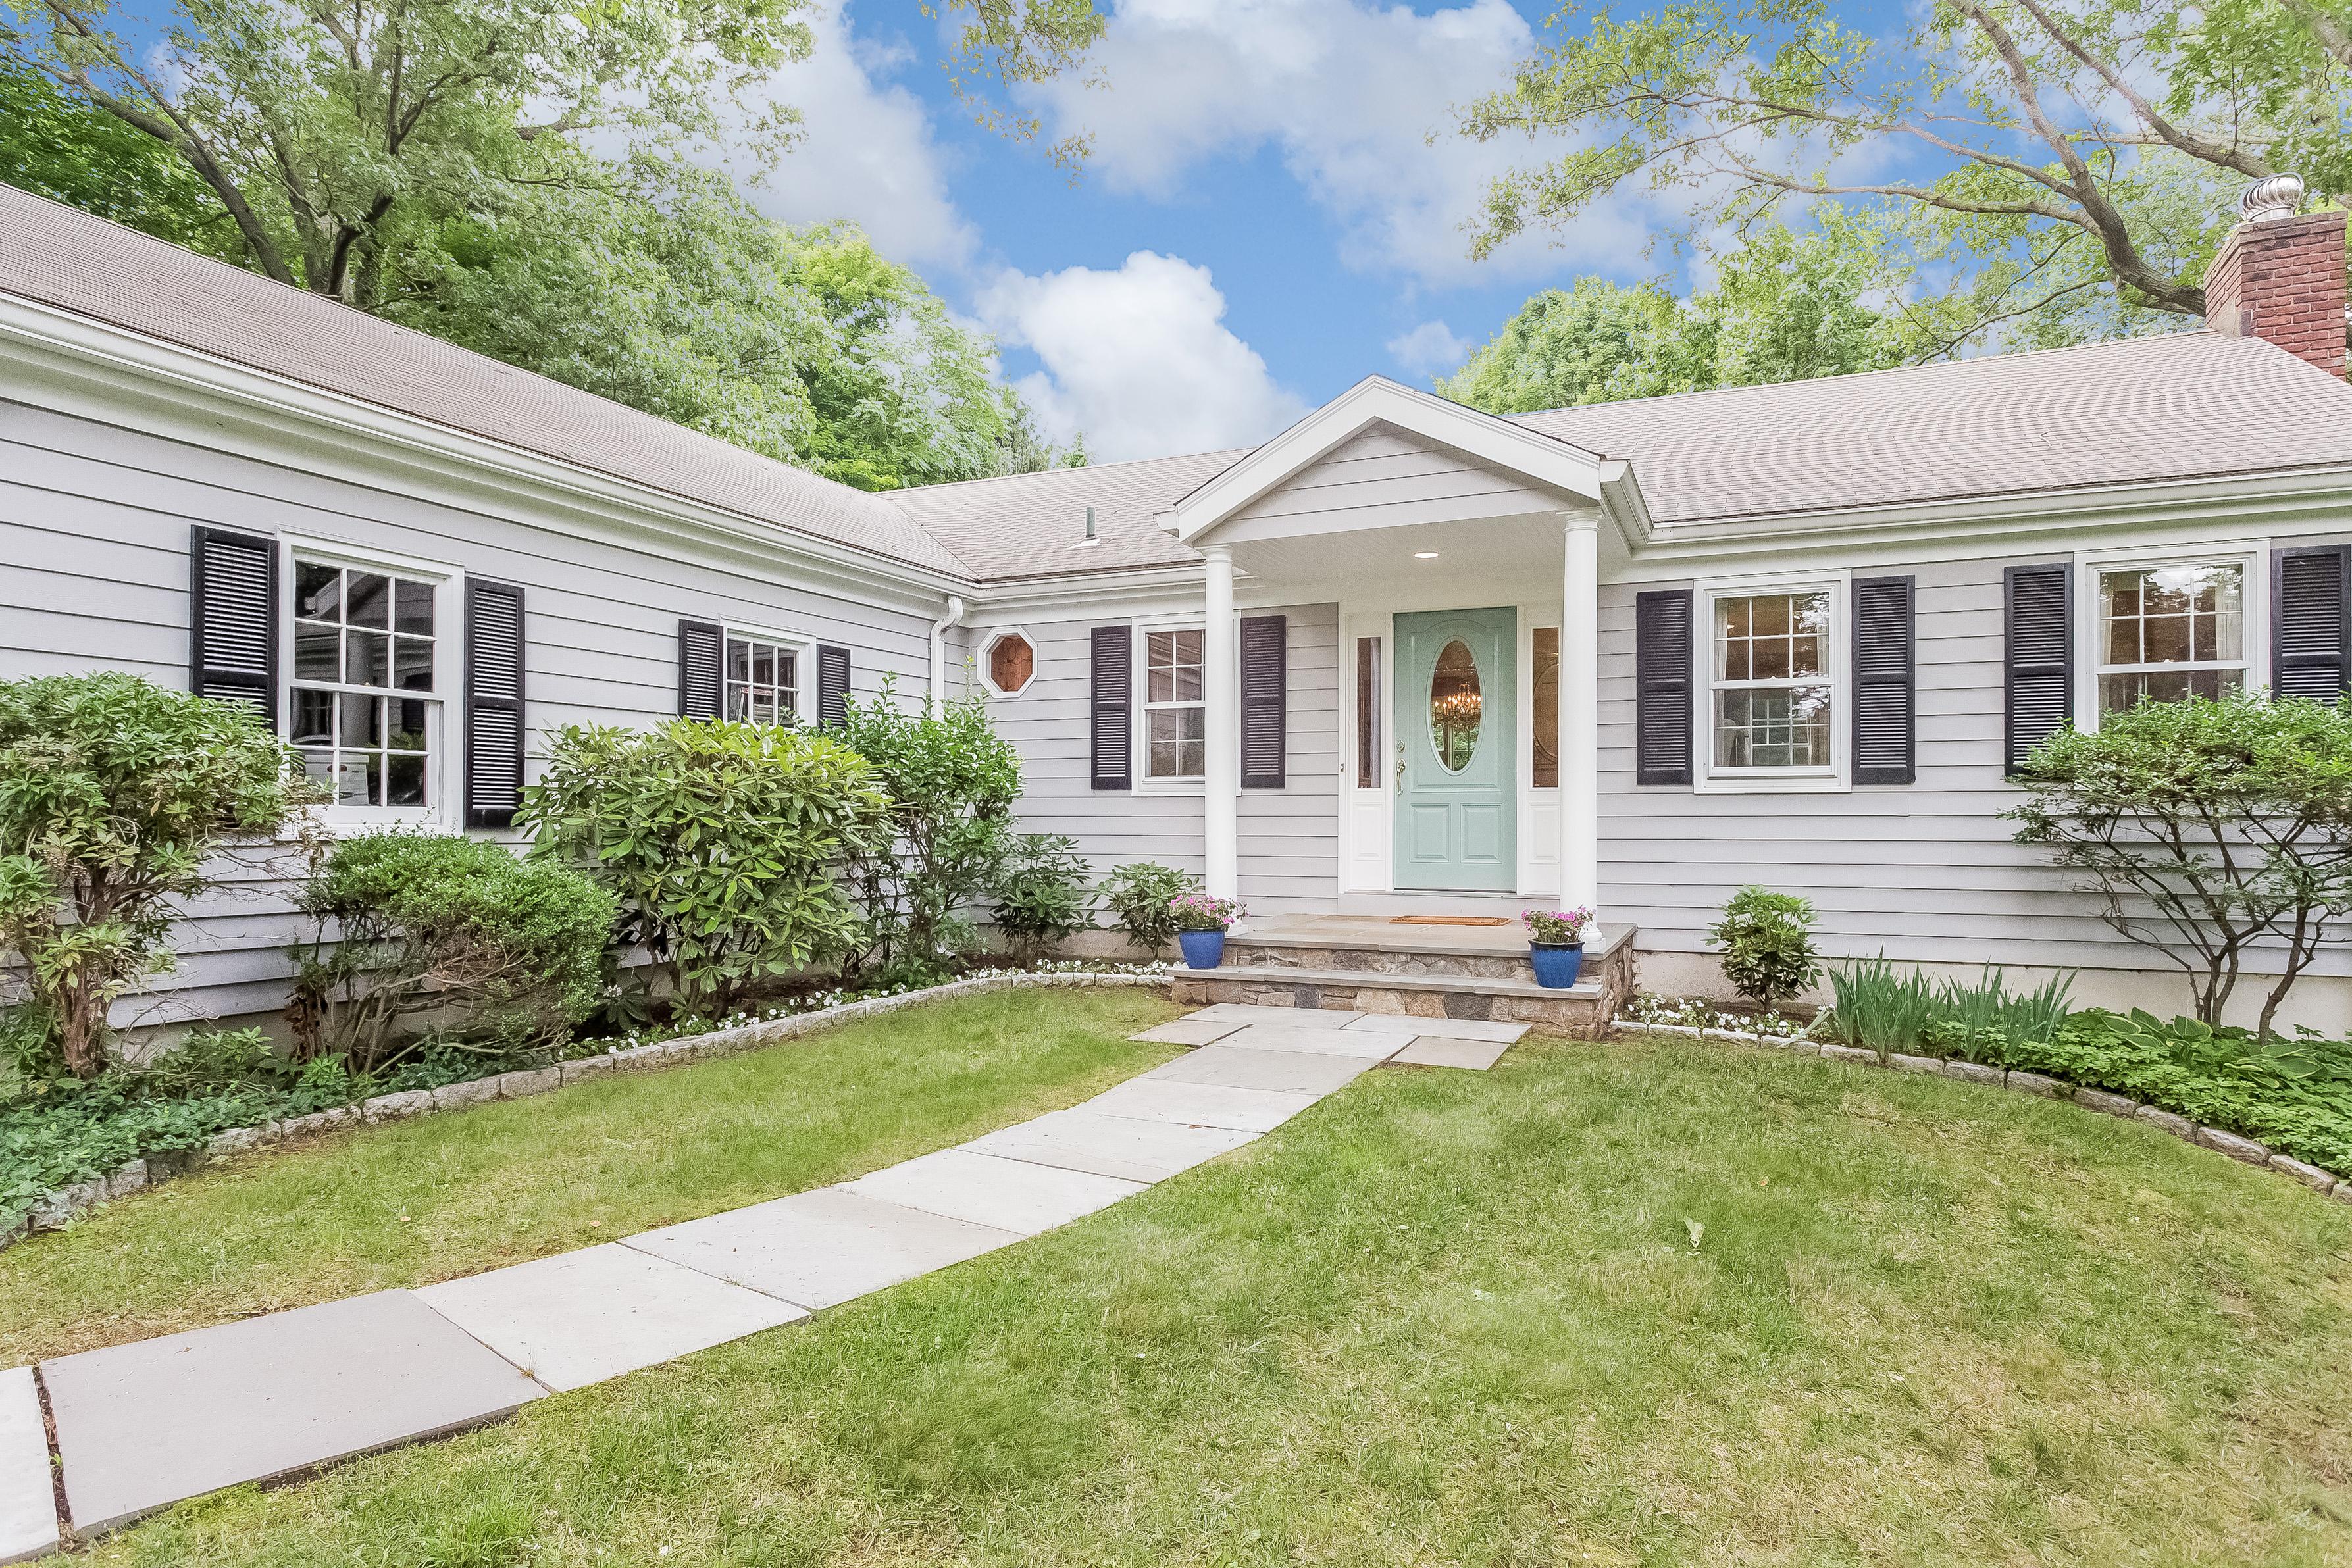 Villa per Vendita alle ore 332 Rowayton Avenue Rowayton, Norwalk, Connecticut 06853 Stati Uniti